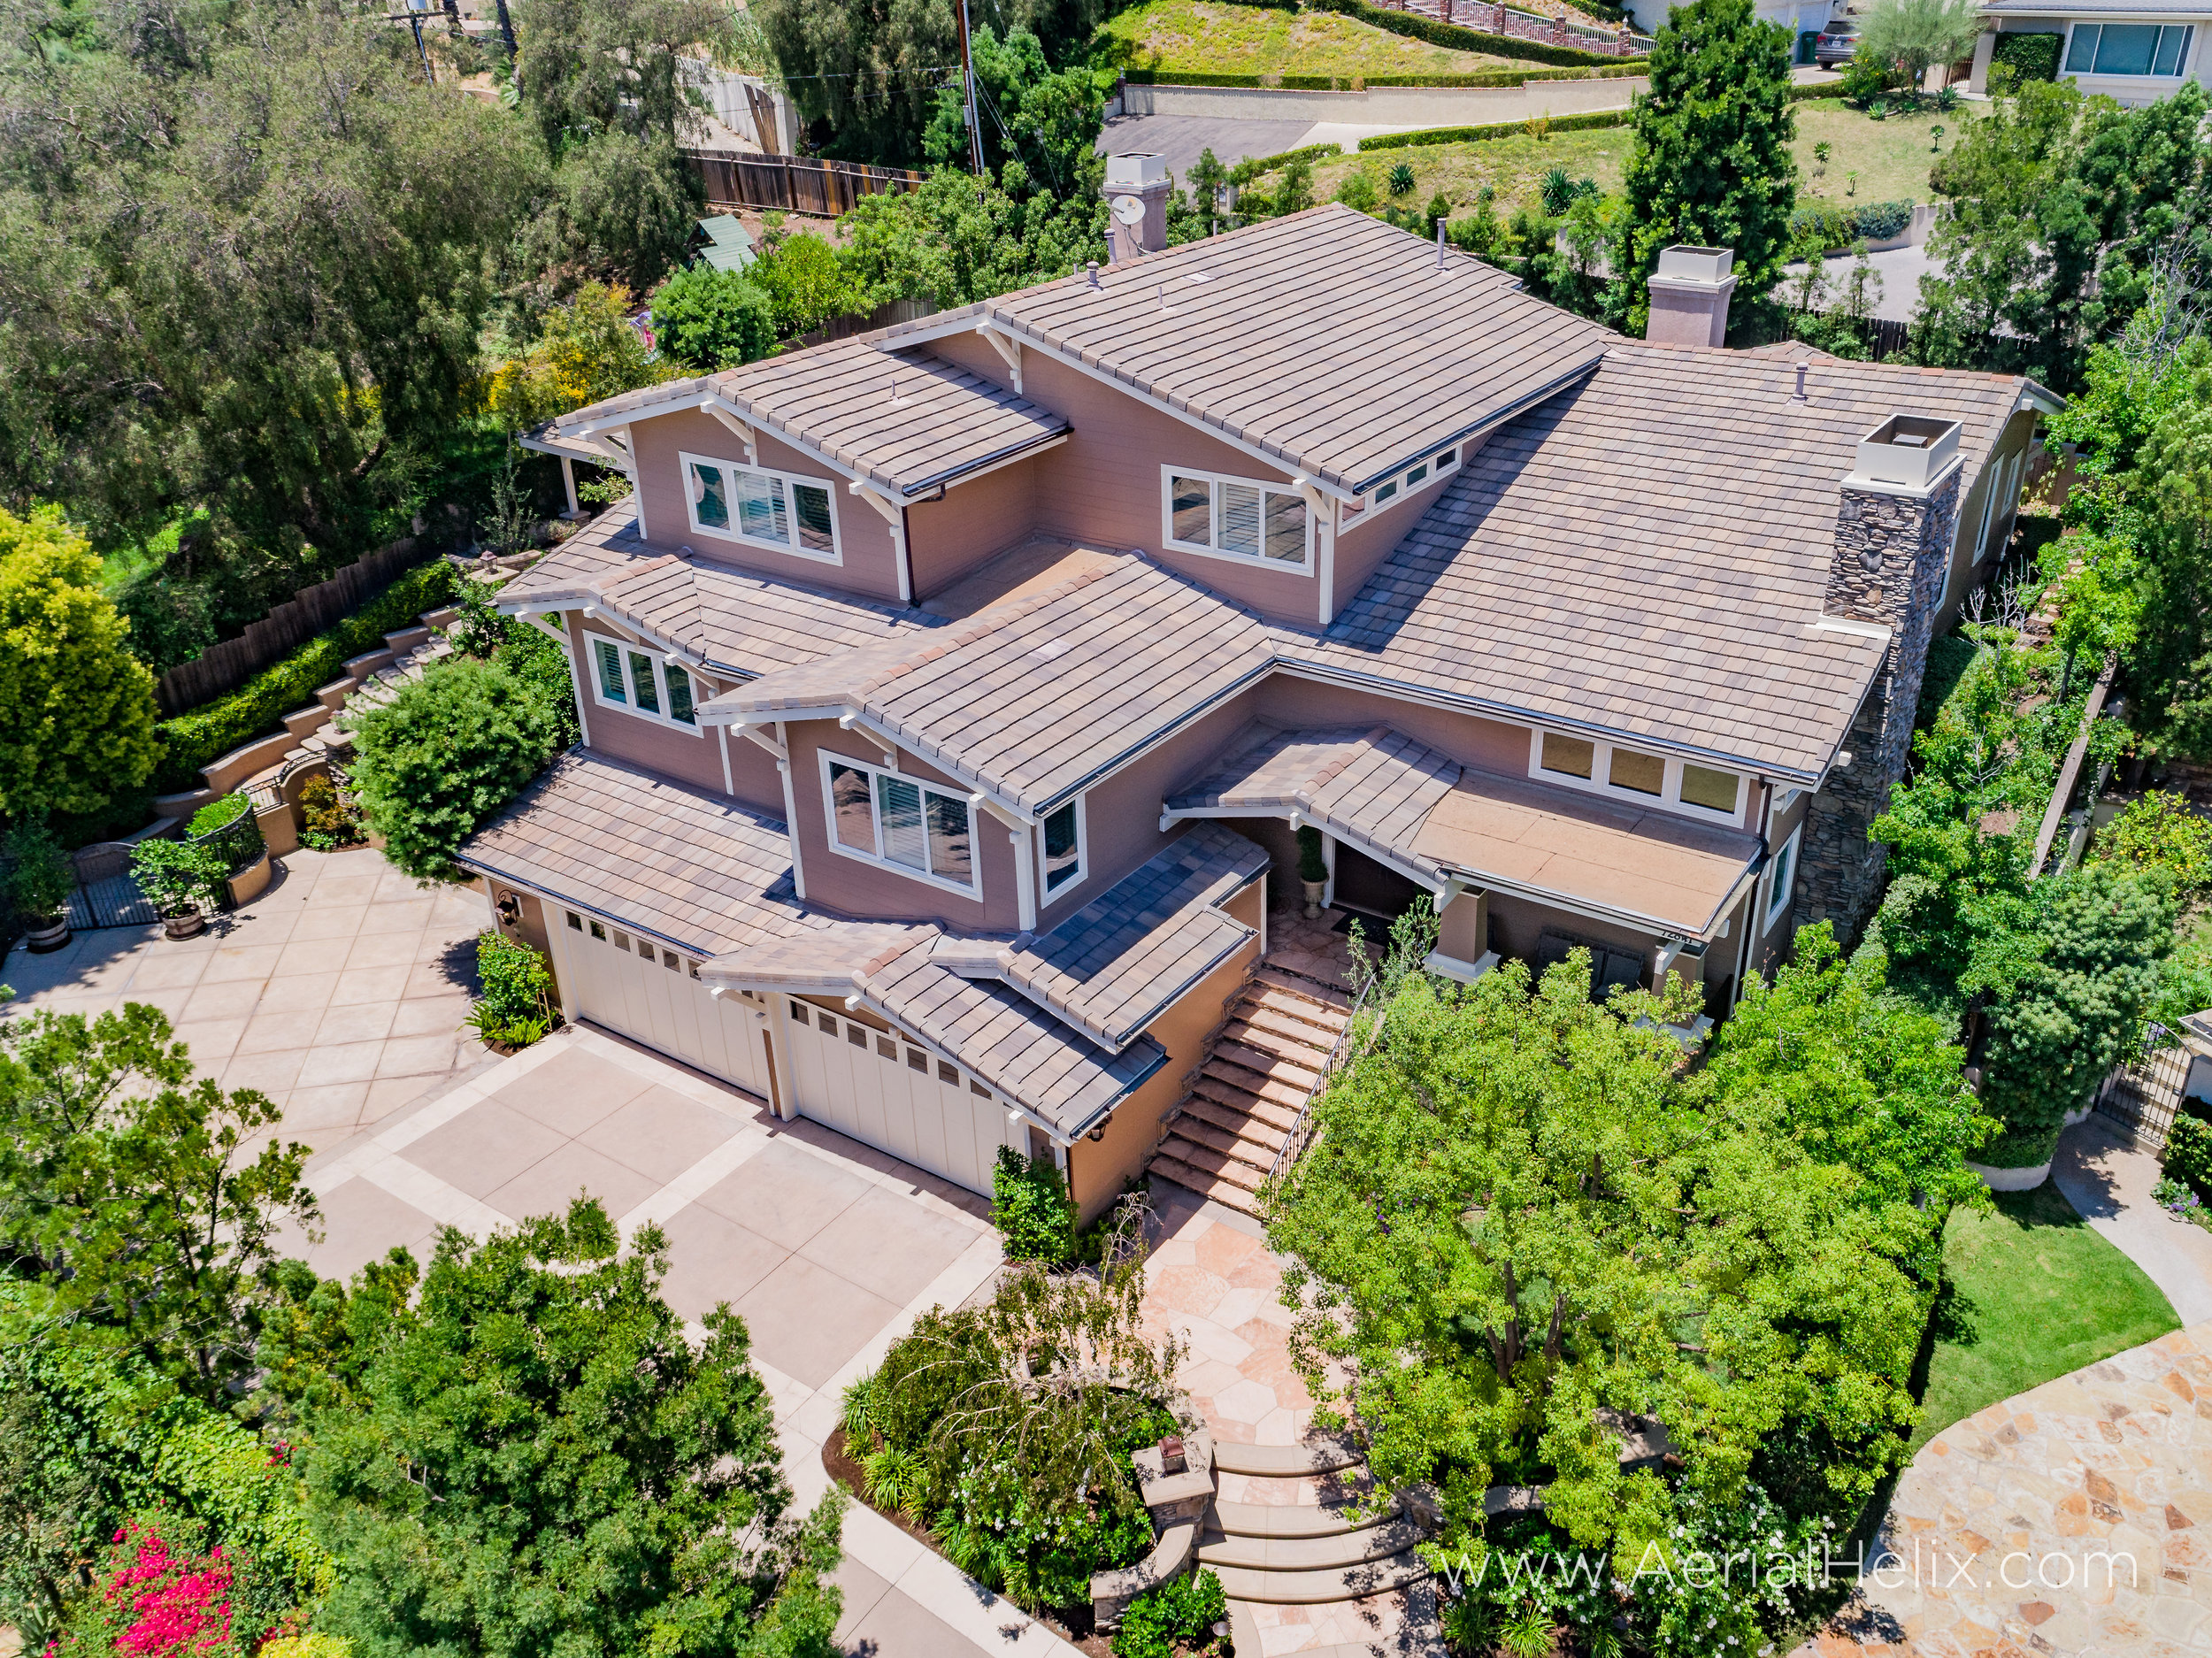 HELIX - Craftsman Lane - Real Estate Drone Photographer-7.jpg